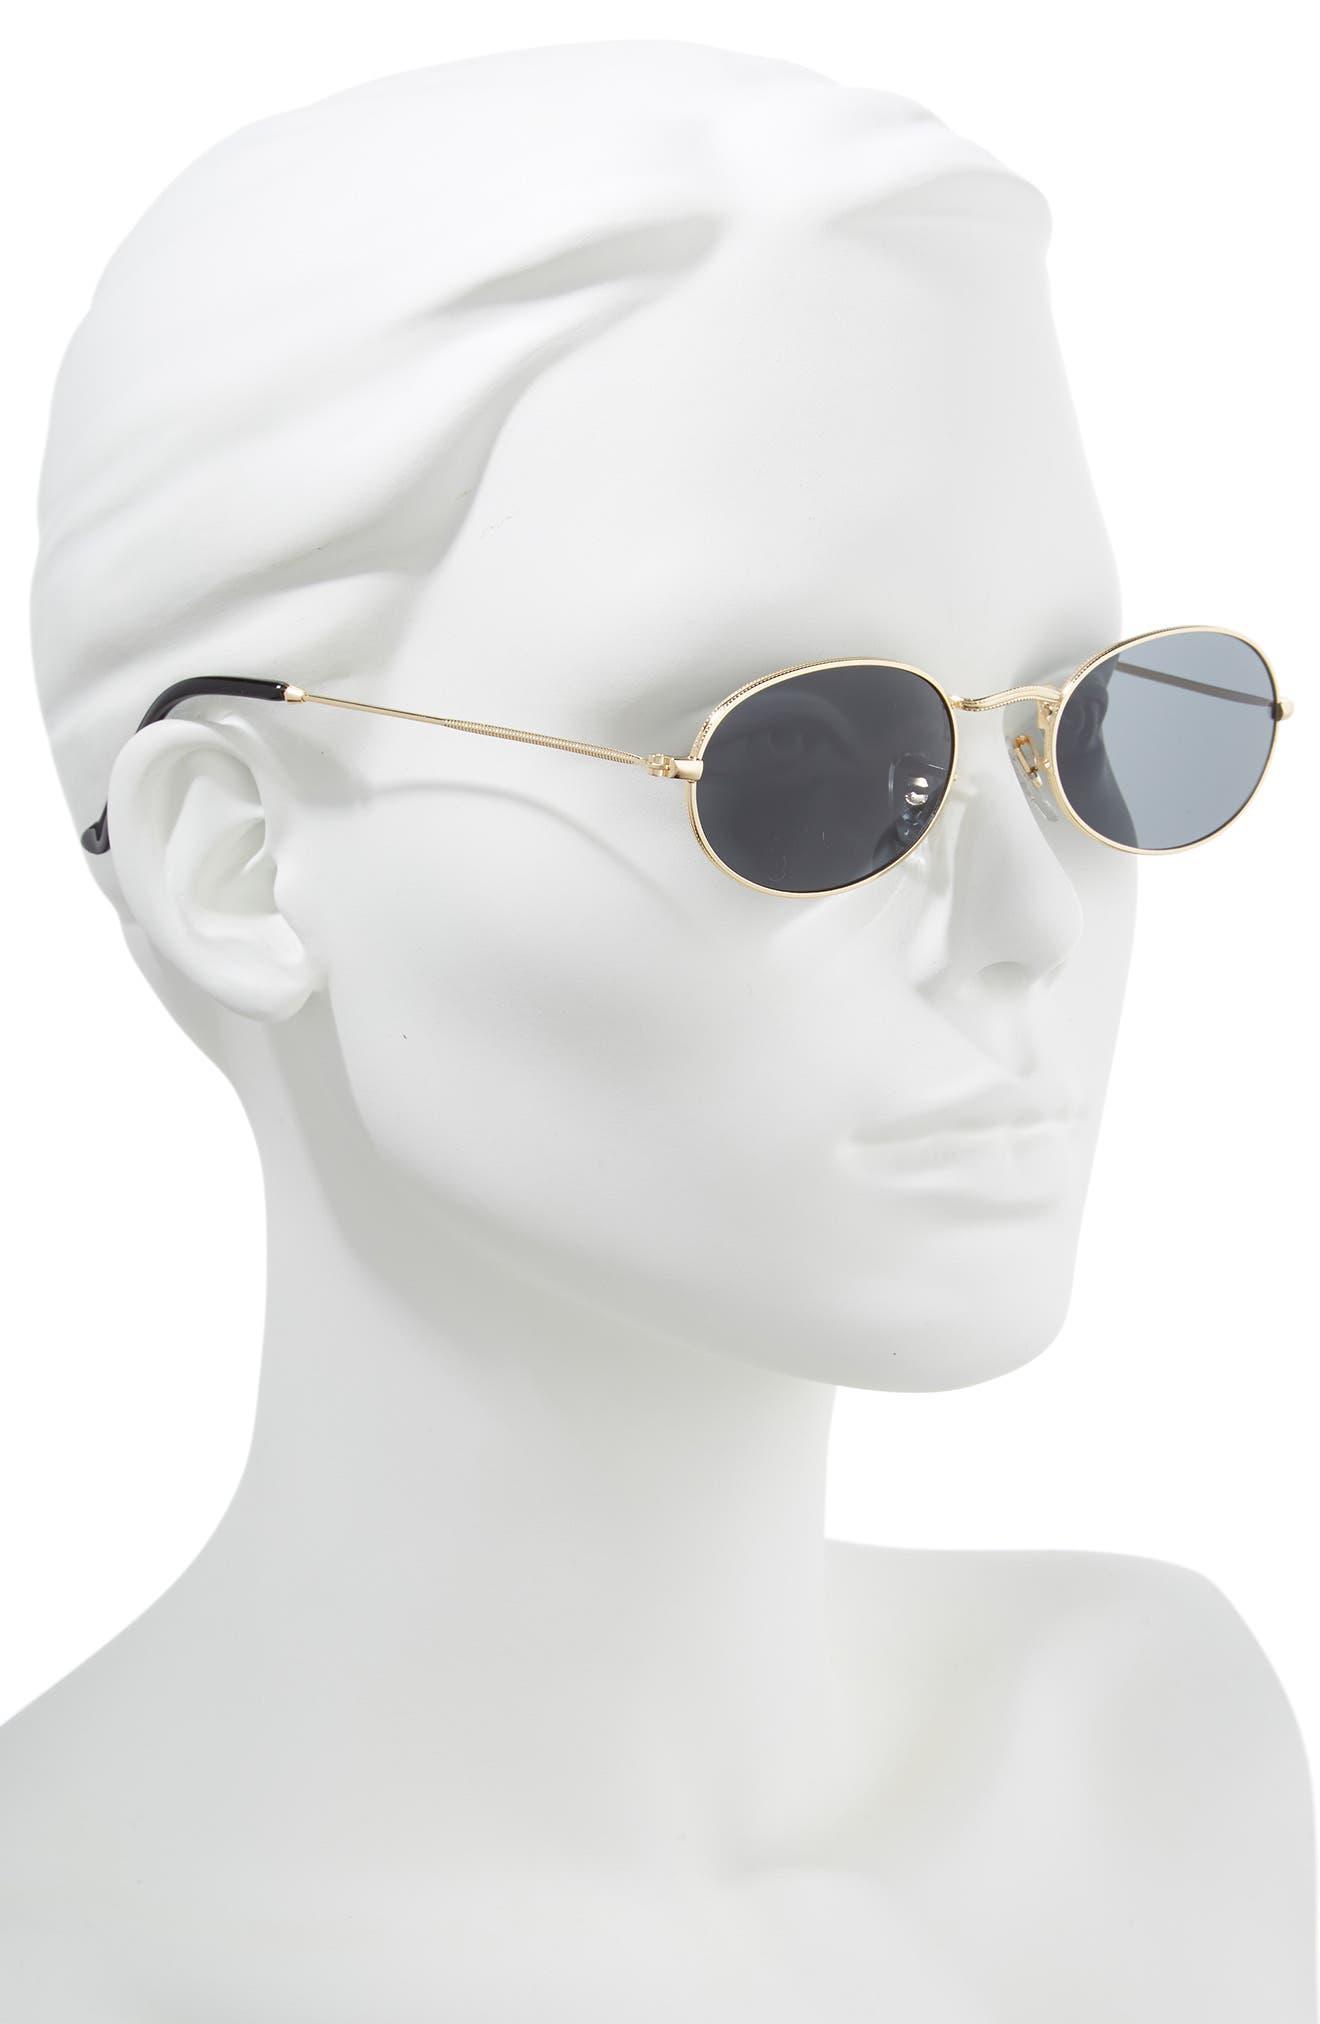 50mm Round Sunglasses,                             Alternate thumbnail 2, color,                             GOLD/ BLACK